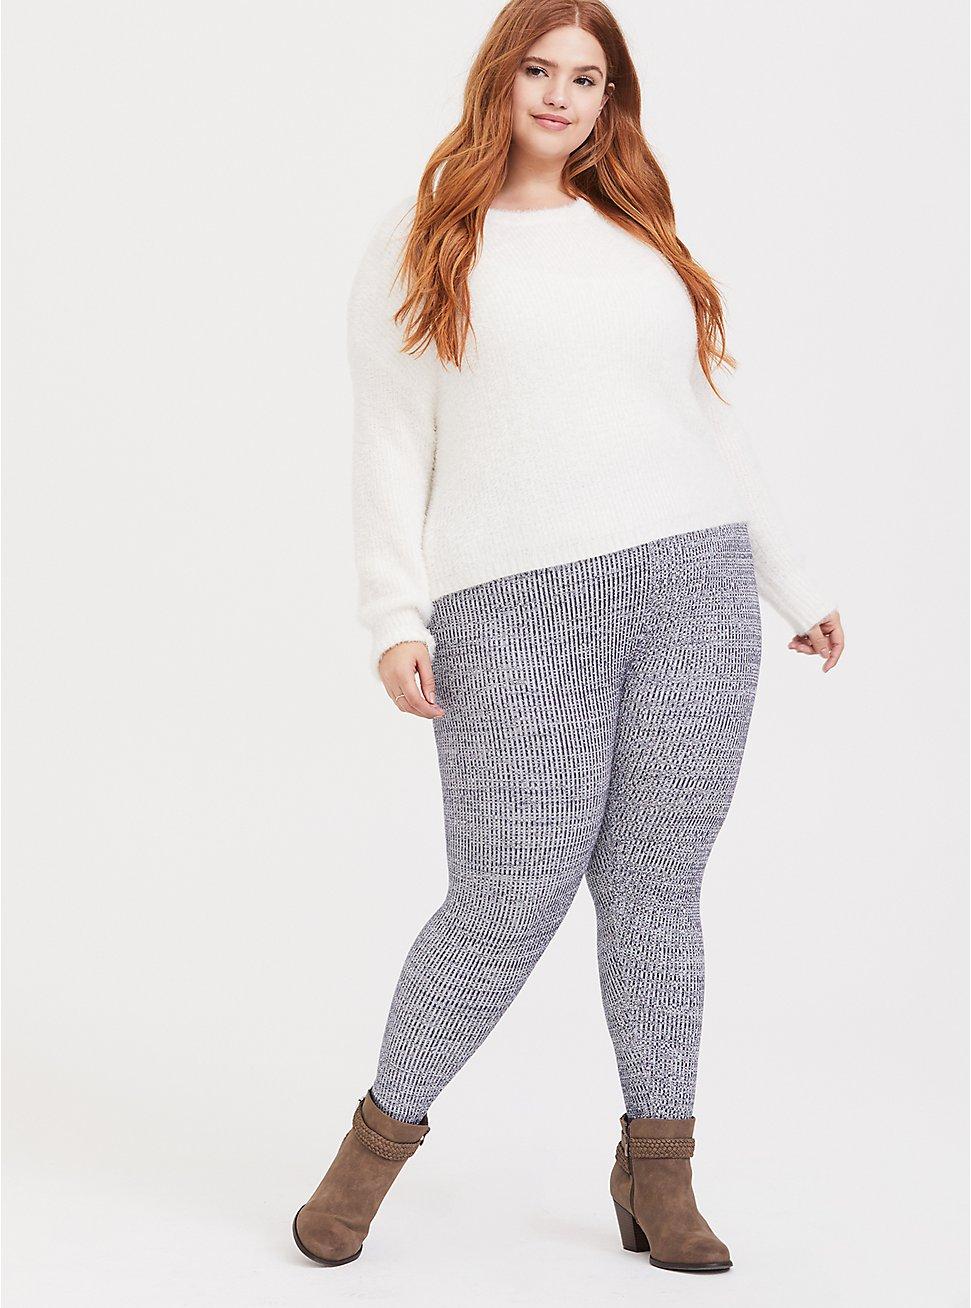 Sweater-Knit Legging - Space-Dye Navy , PEACOAT, hi-res